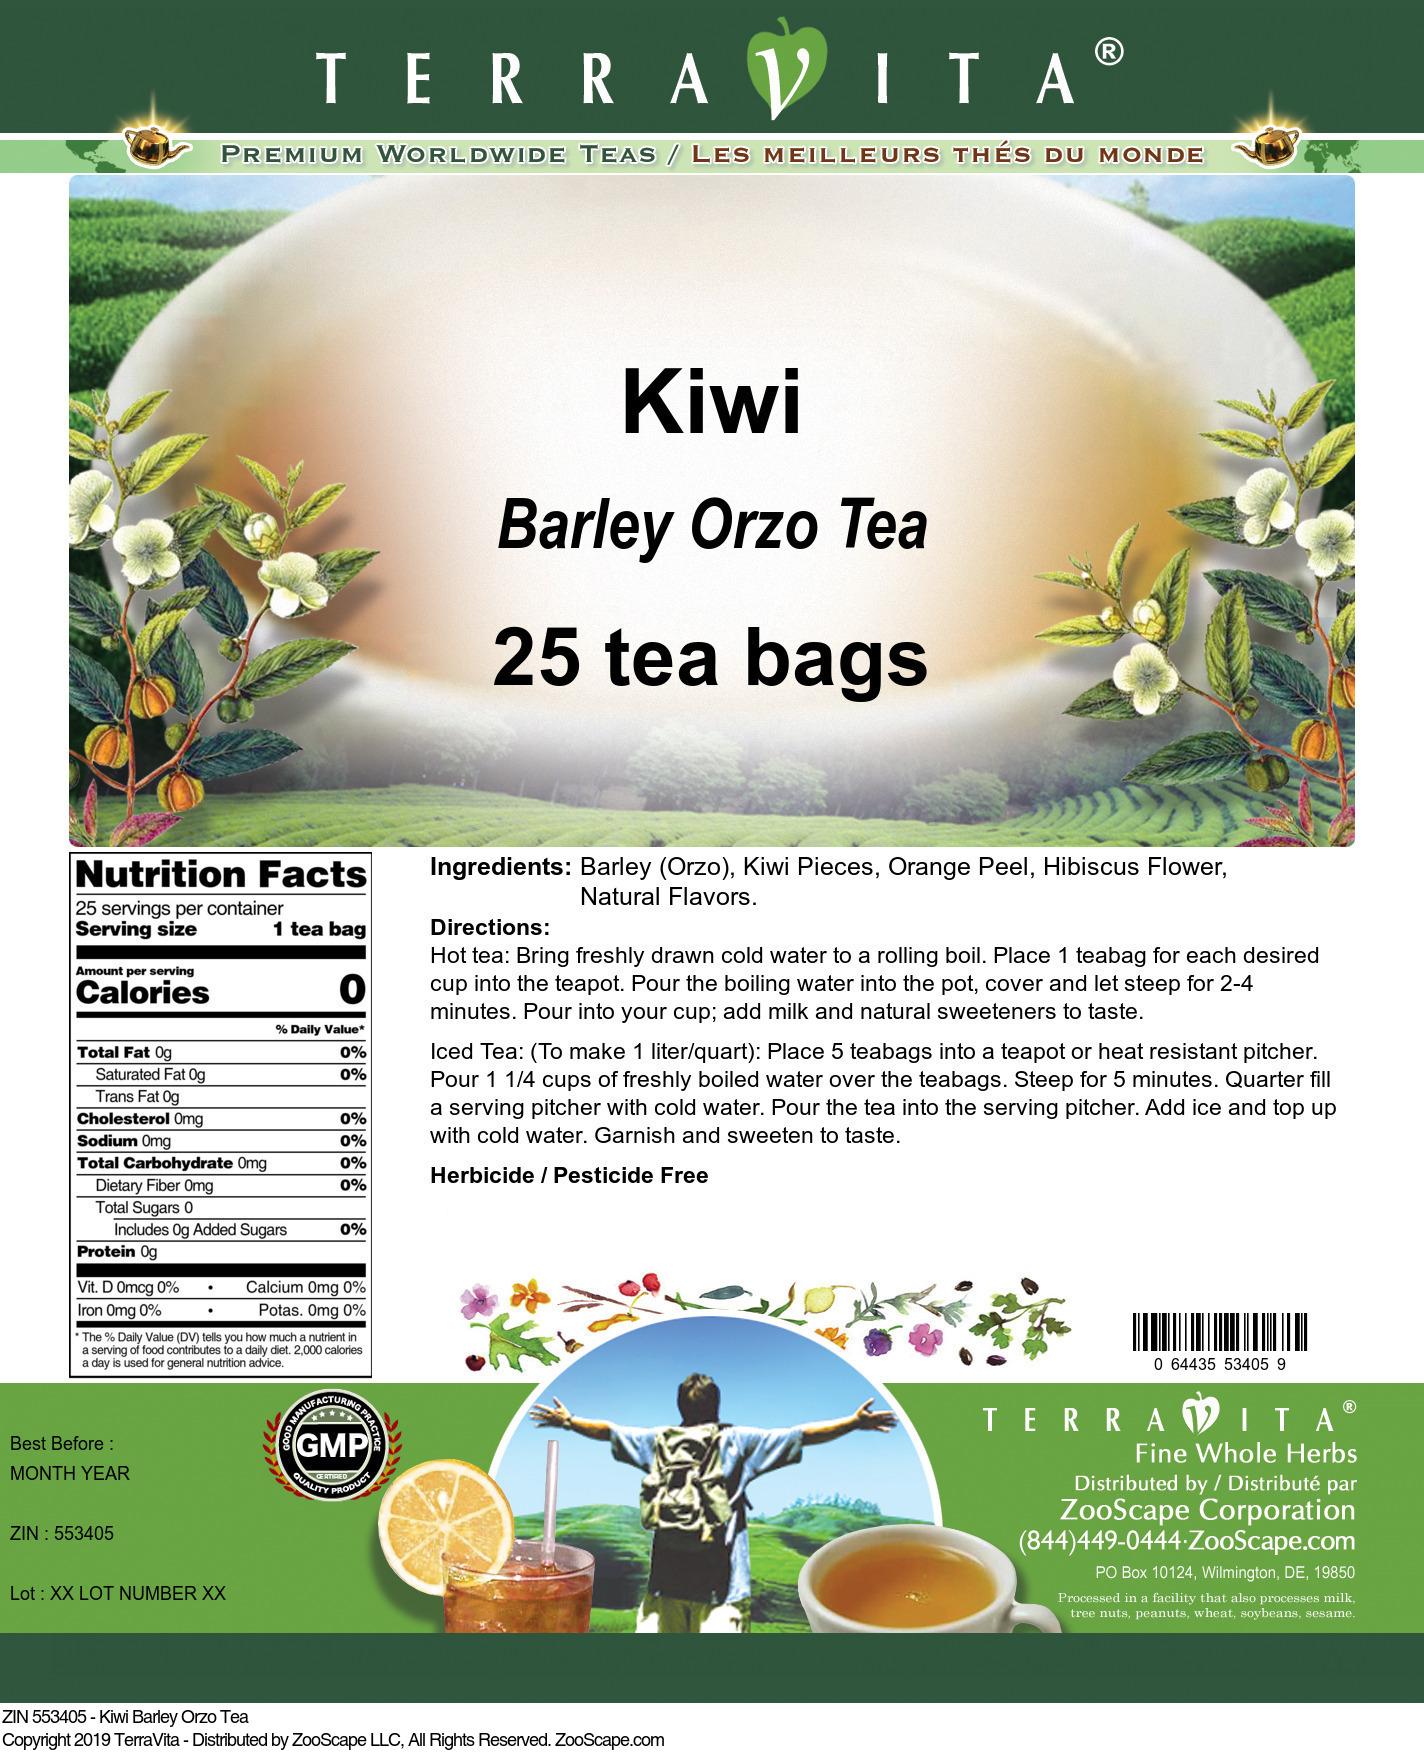 Kiwi Barley Orzo Tea